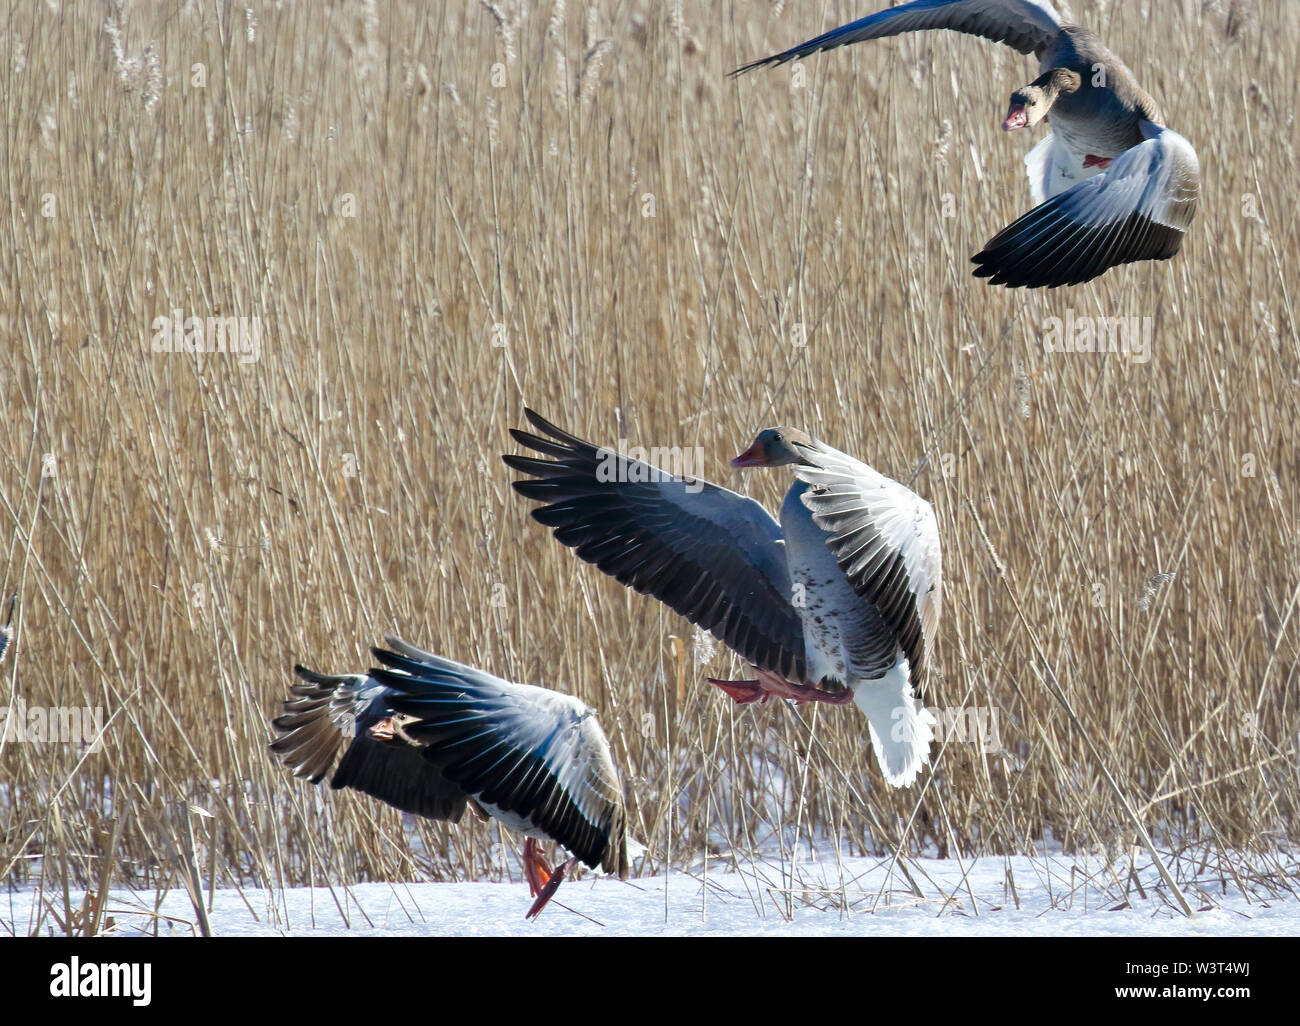 greylag goose - Stock Image